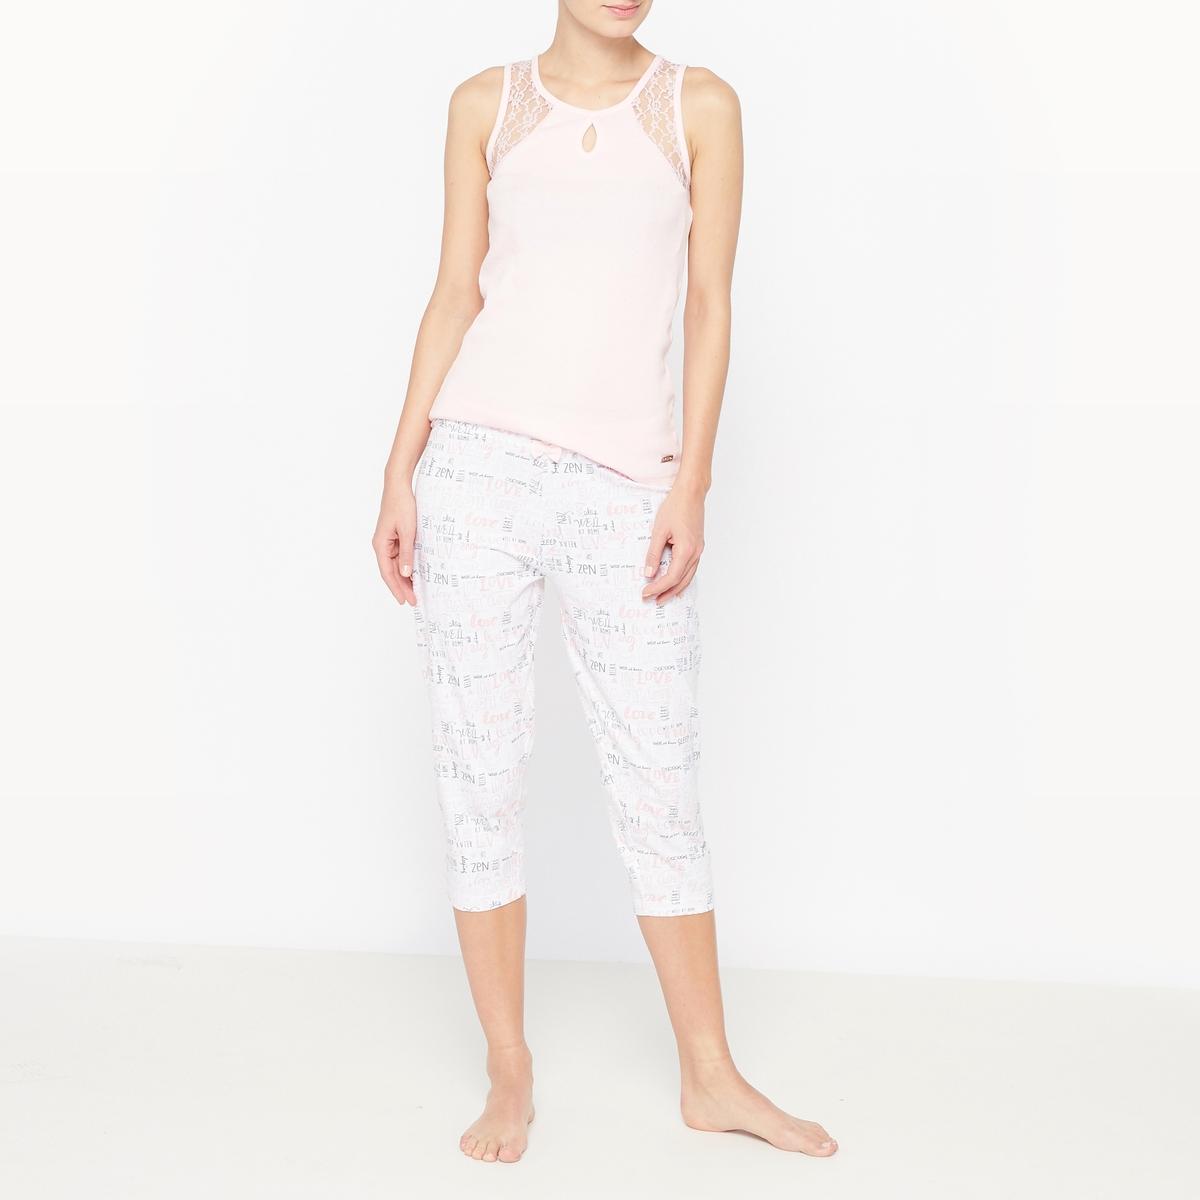 Пижама с короткими брюками из хлопка Poème